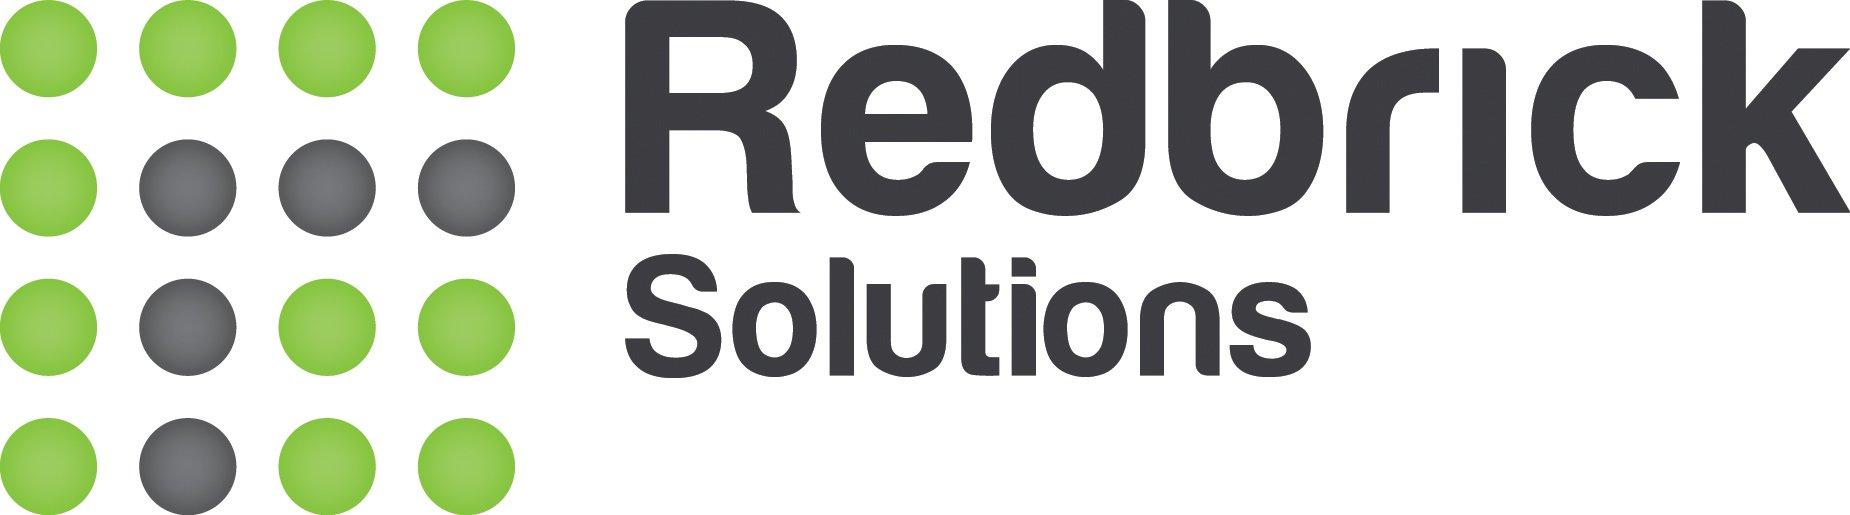 Redbrick solutions icon